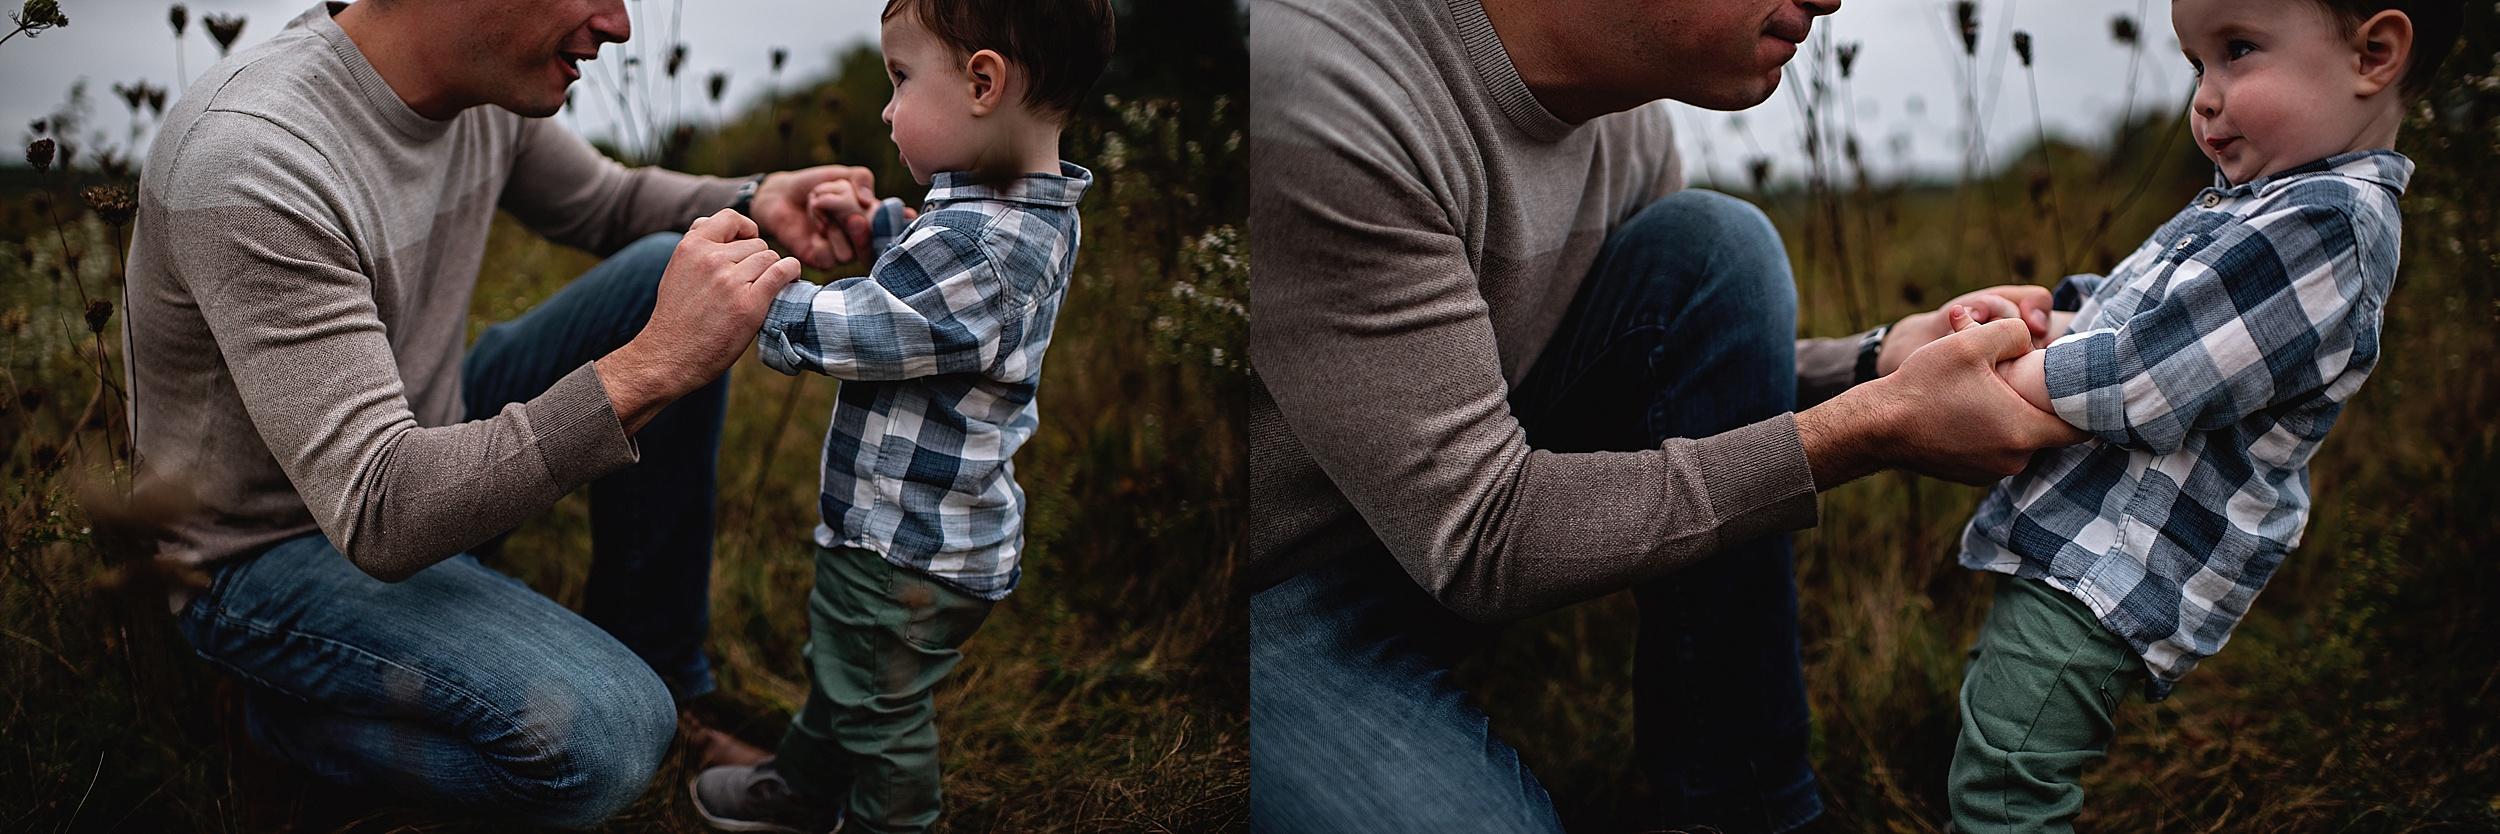 lauren-grayson-photography-portrait-artist-akron-cleveland-ohio-photographer-family-session-fields-sunset-fall_0197.jpg